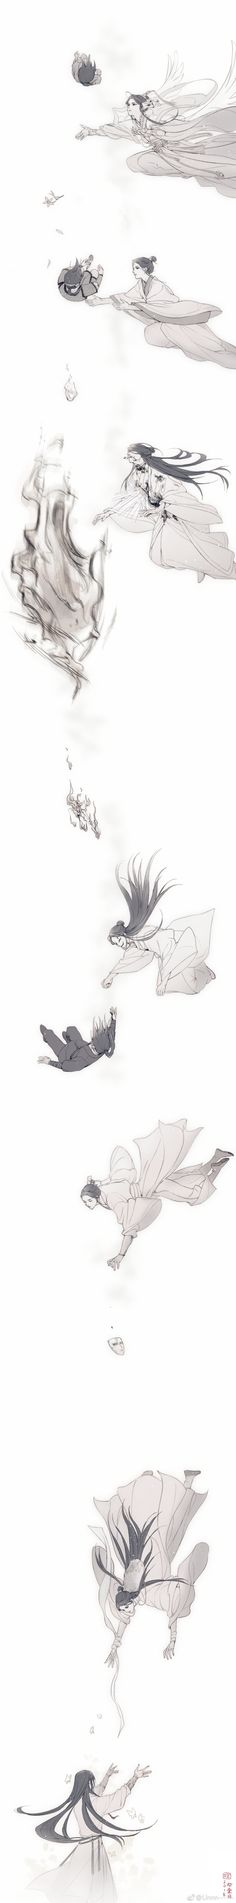 Cute Anime Pics, Anime Love, Fan Anime, Celestial, Chinese Art, Novels, Blessed, Heaven, Doujinshi